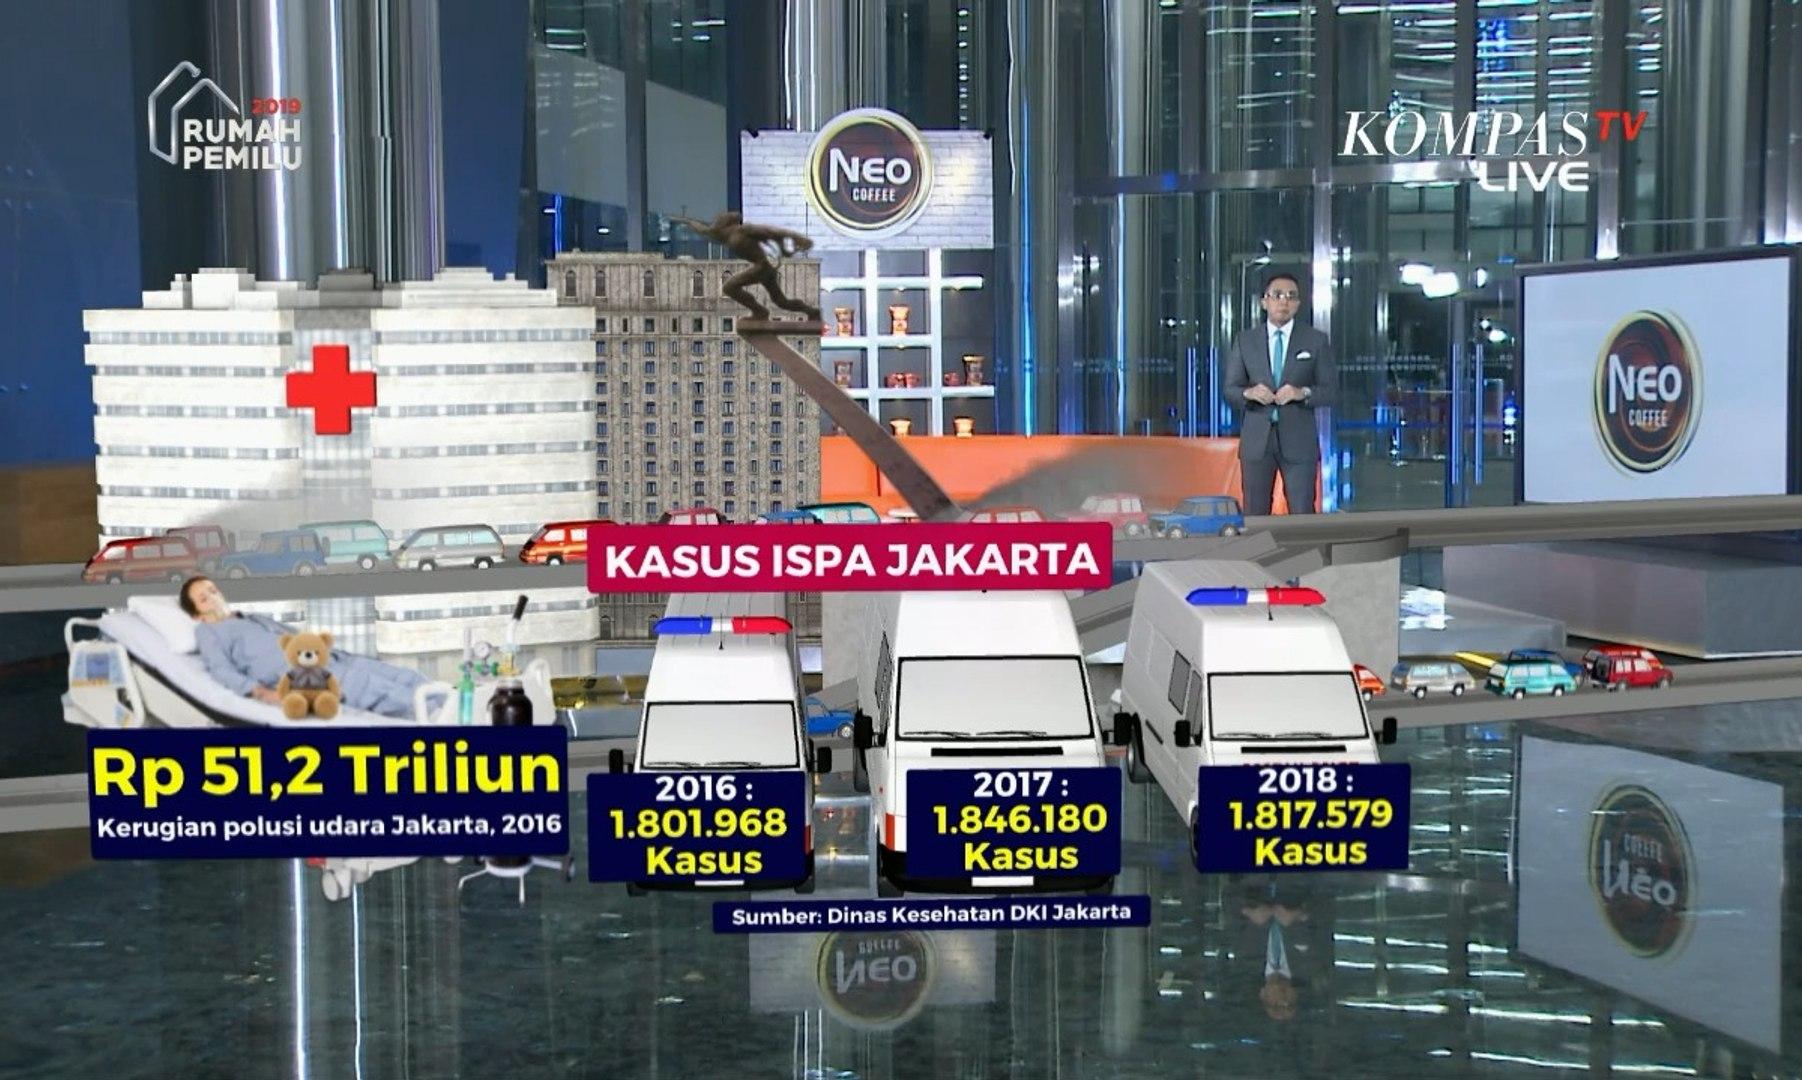 Data Fakta Polusi Jakarta, dari Kerugian Rp 51,2 Triliun Hingga 1,8 Juta Penderita ISPA